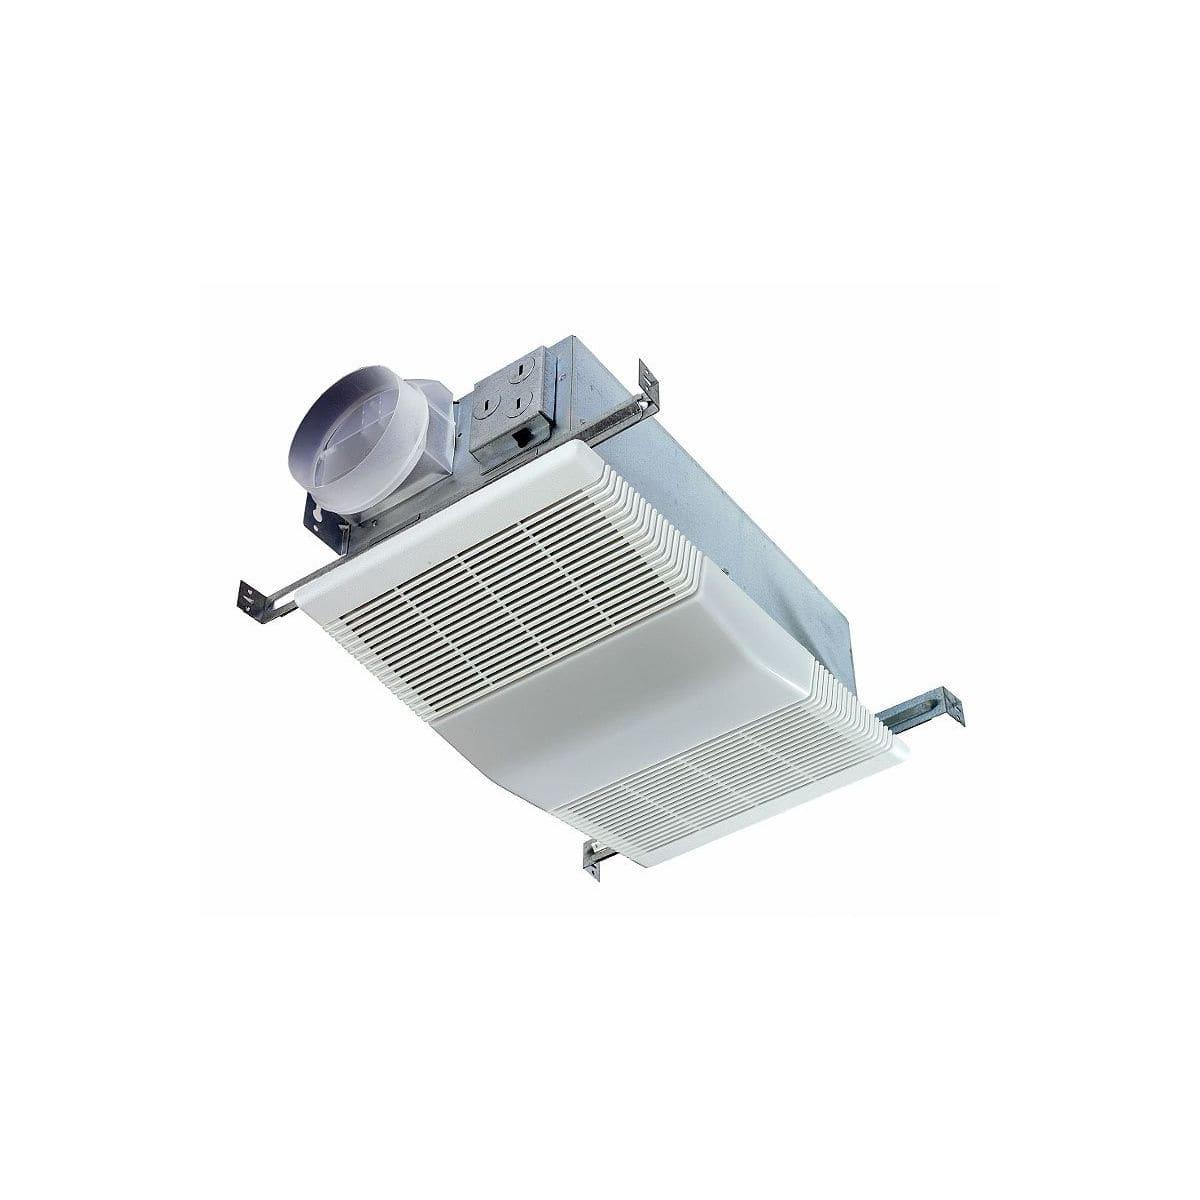 Nutone Exhaust Fans Ventilation 668rp, Nutone Bathroom Fan With Light